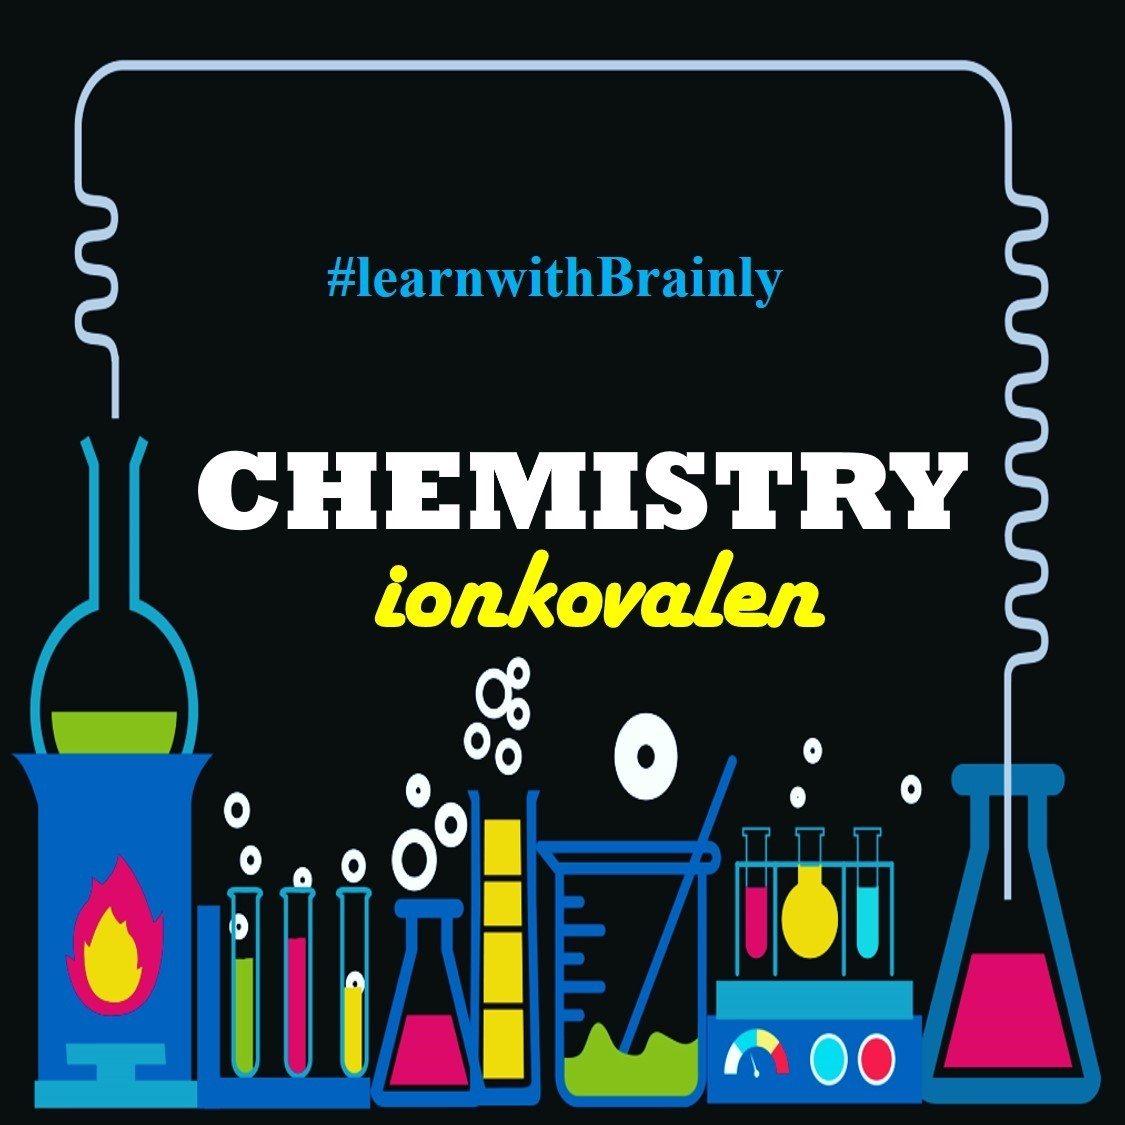 Tulislah Rumus Kimia Asam Basa Berikut A Asam Klorida B Asam Sulfat C Asam Nitrat D Asam Brainly Co Id